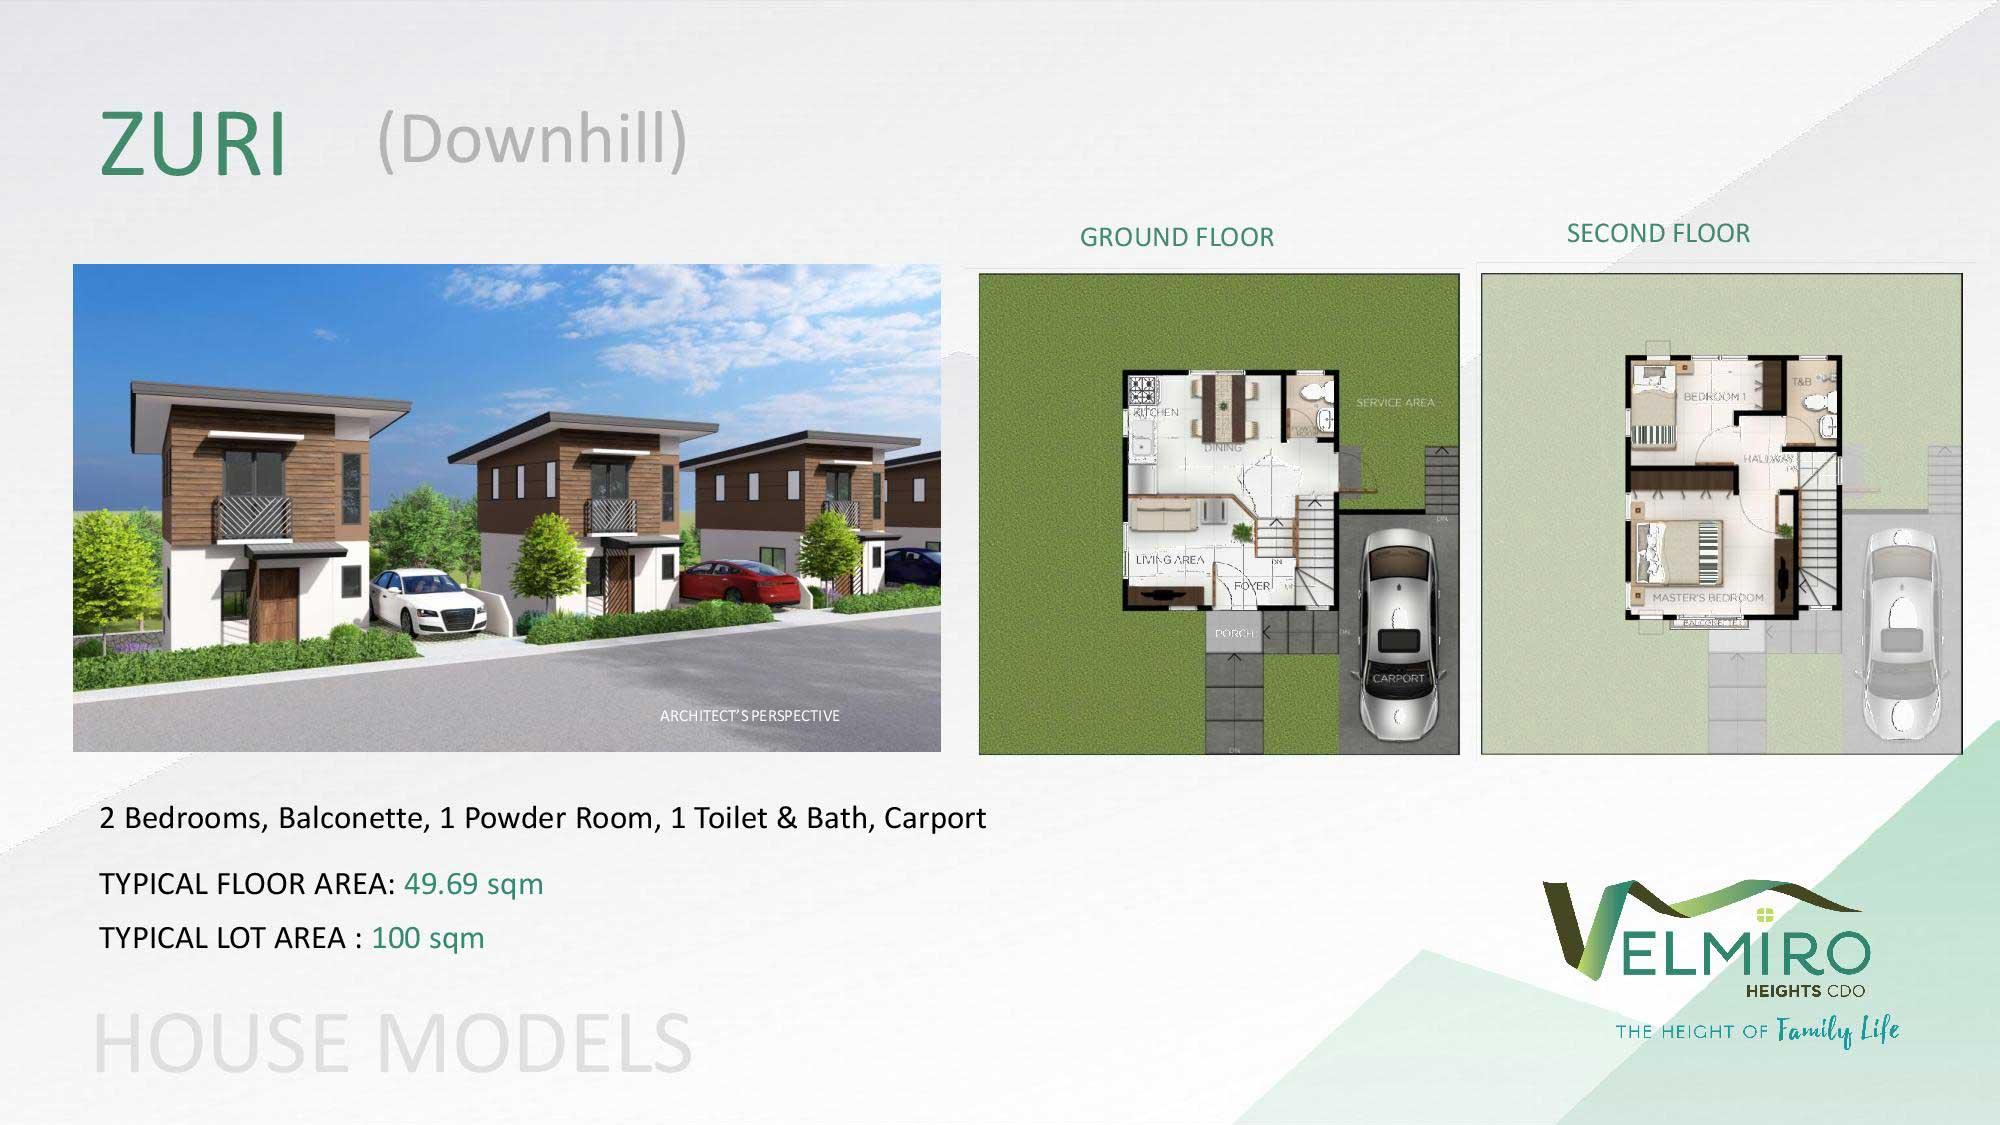 Velmiro heights agusan house model zuri downhill web gmc